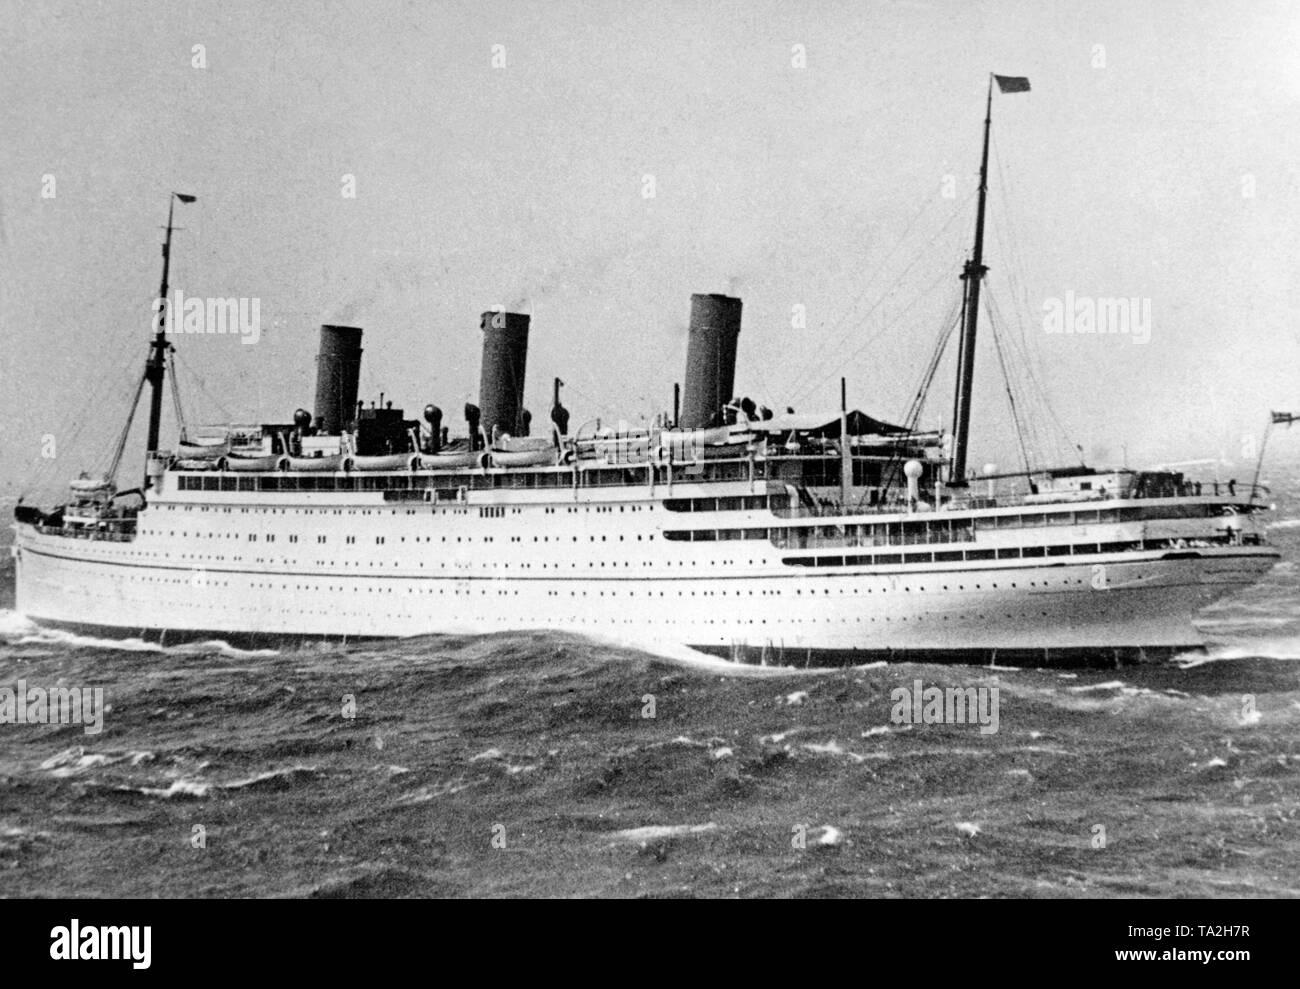 passenger ship vulcania 1930 - HD1300×988